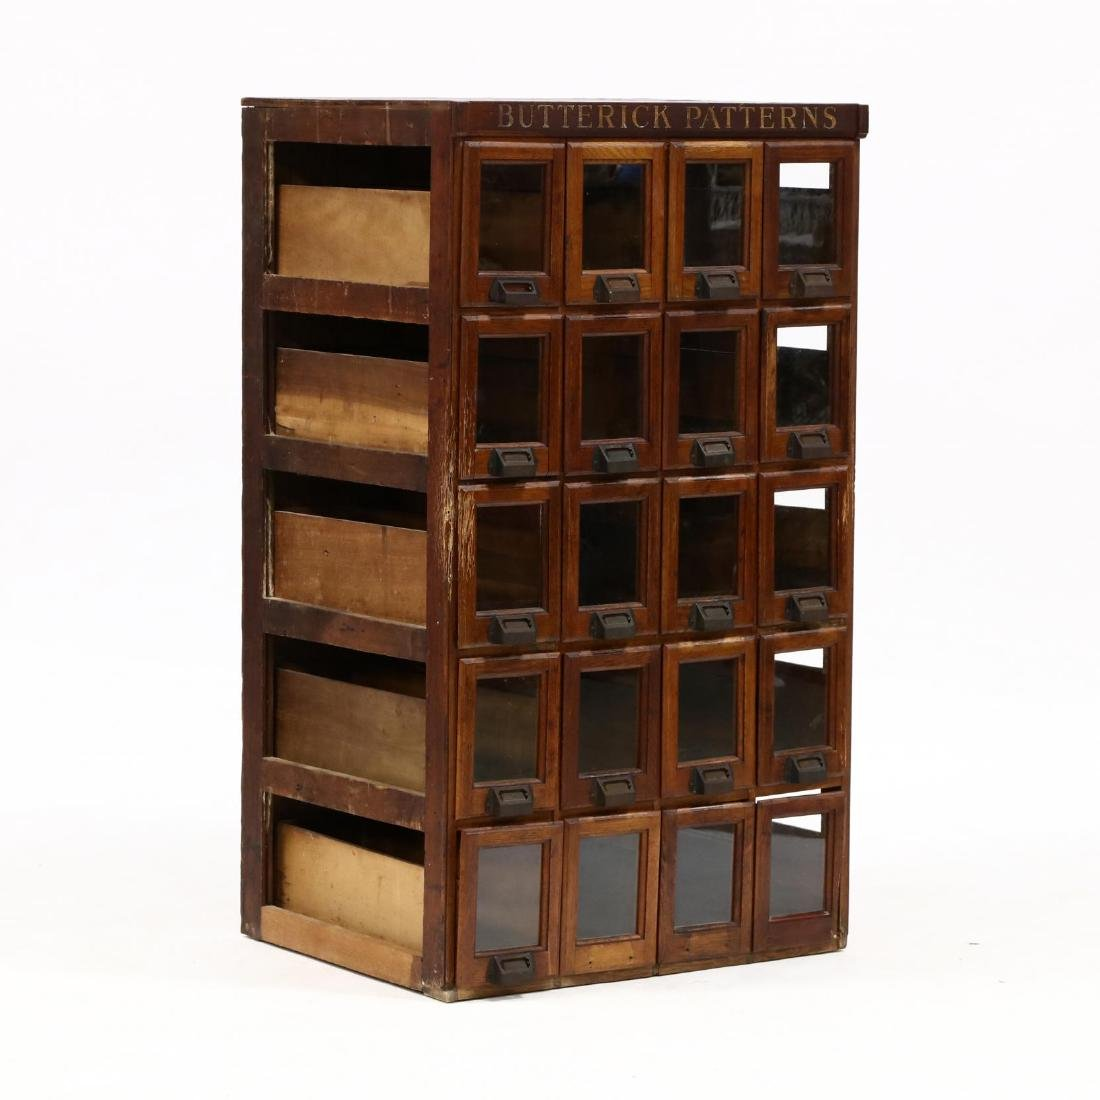 "Vunate Oak ""Butterick Pattern"" Country Store Cabinet"